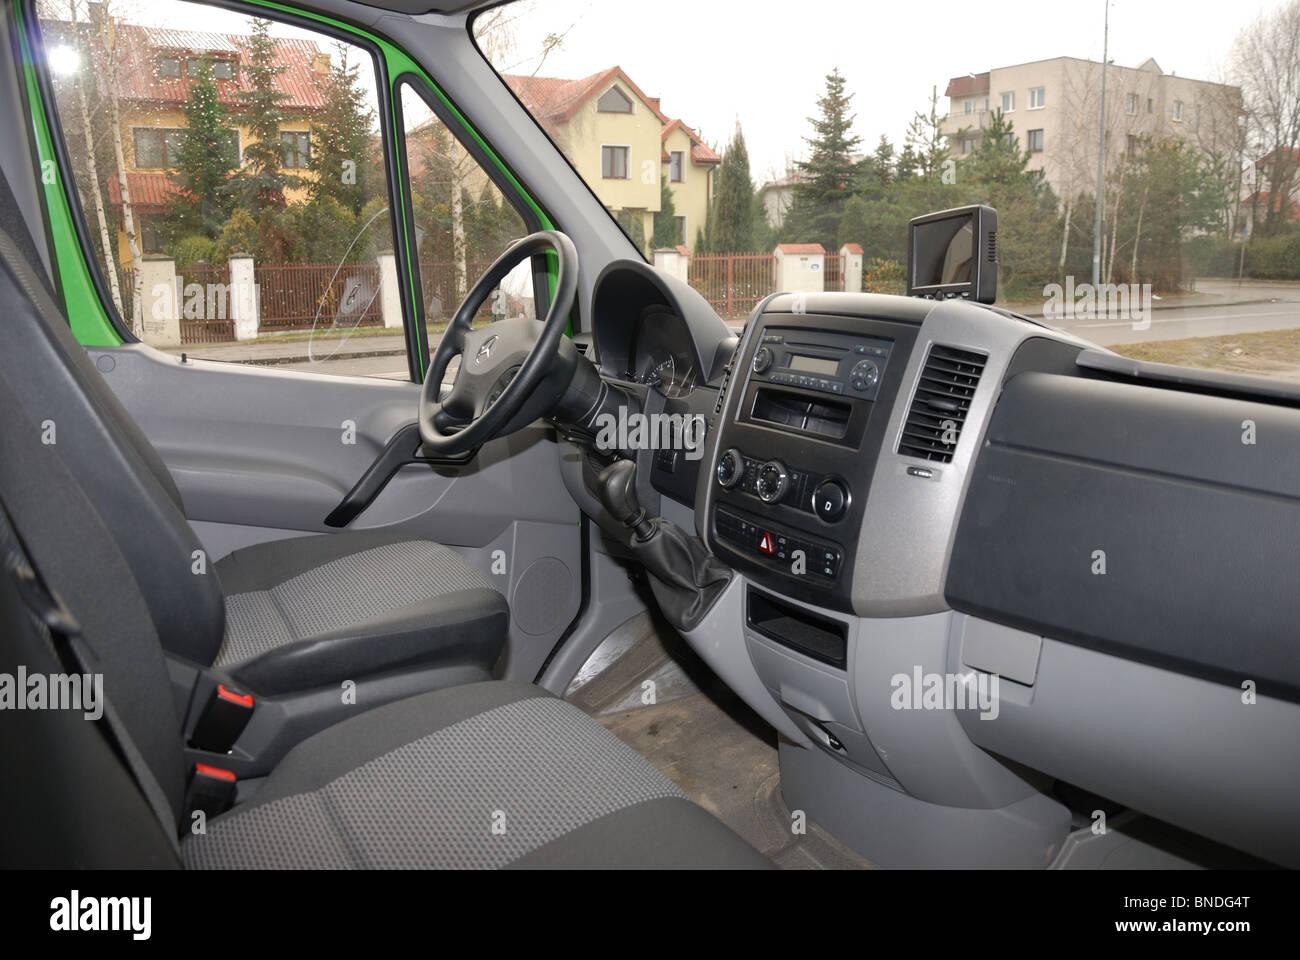 Mercedes benz sprinter 260 cdi van green l3h2 german mcv van interior cabin dashboard